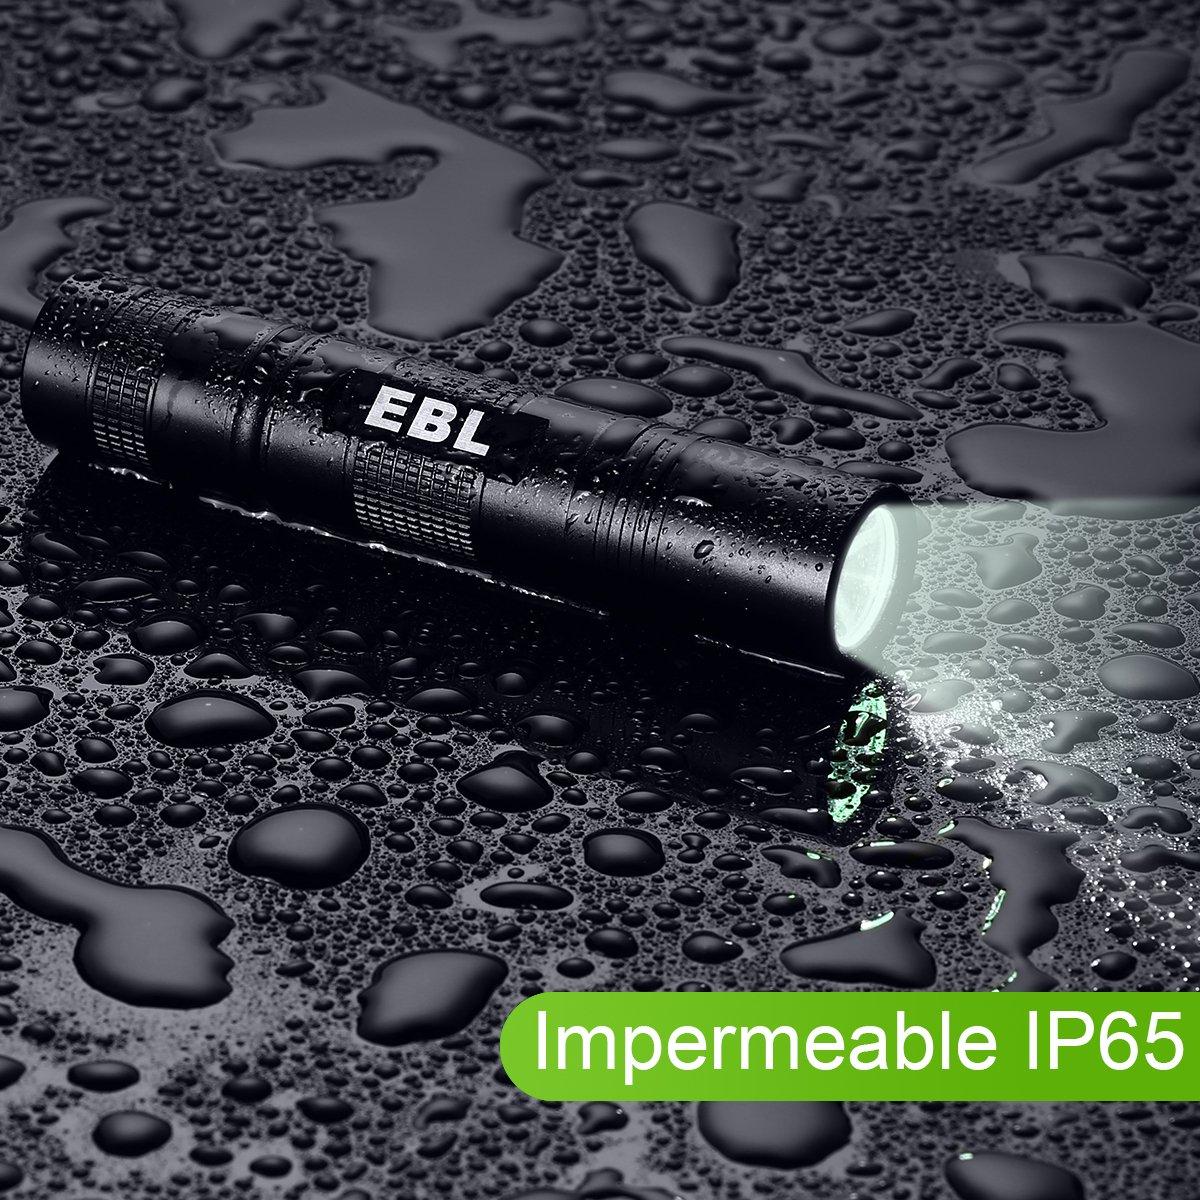 EBL 004 Linterna LED de Mano Resistente al Agua,350 Lumen, Irradiación Distancia: 300-500m con 5 Modos, Perfecta para Ciclismo,Camping, Montañismo-Negro